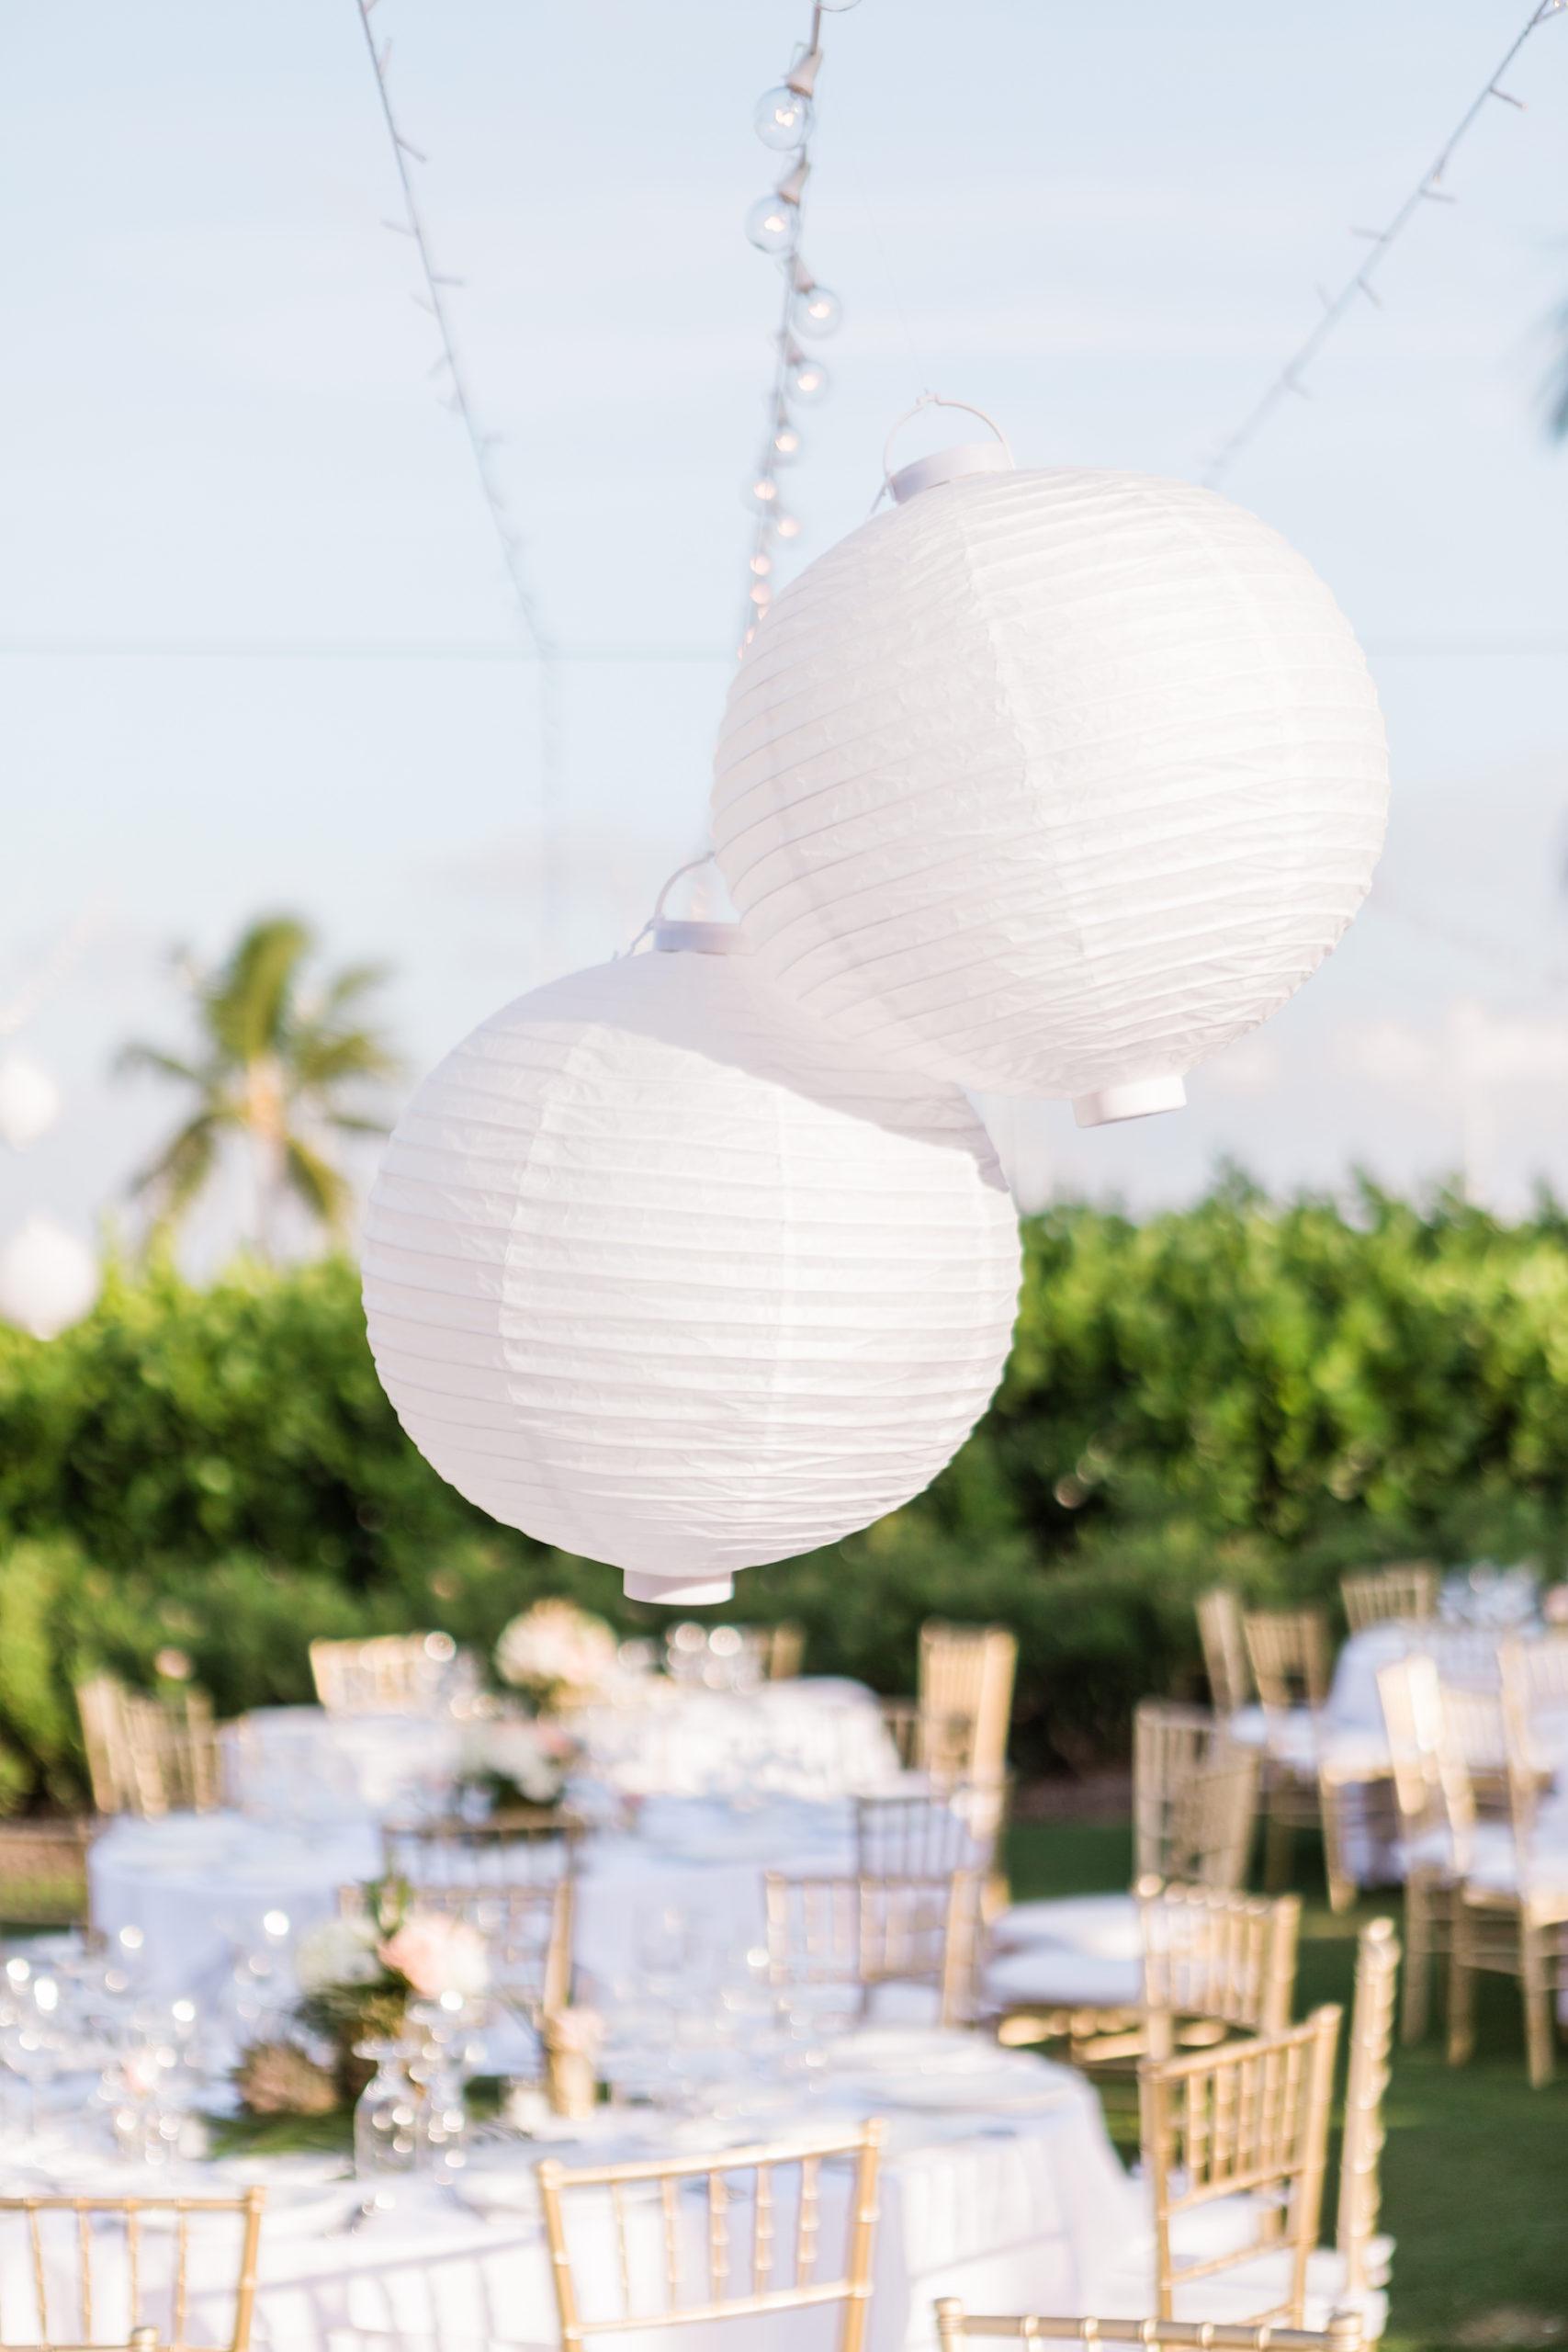 Outdoor Florida Lawn Wedding Reception with Hanging White Lanterns